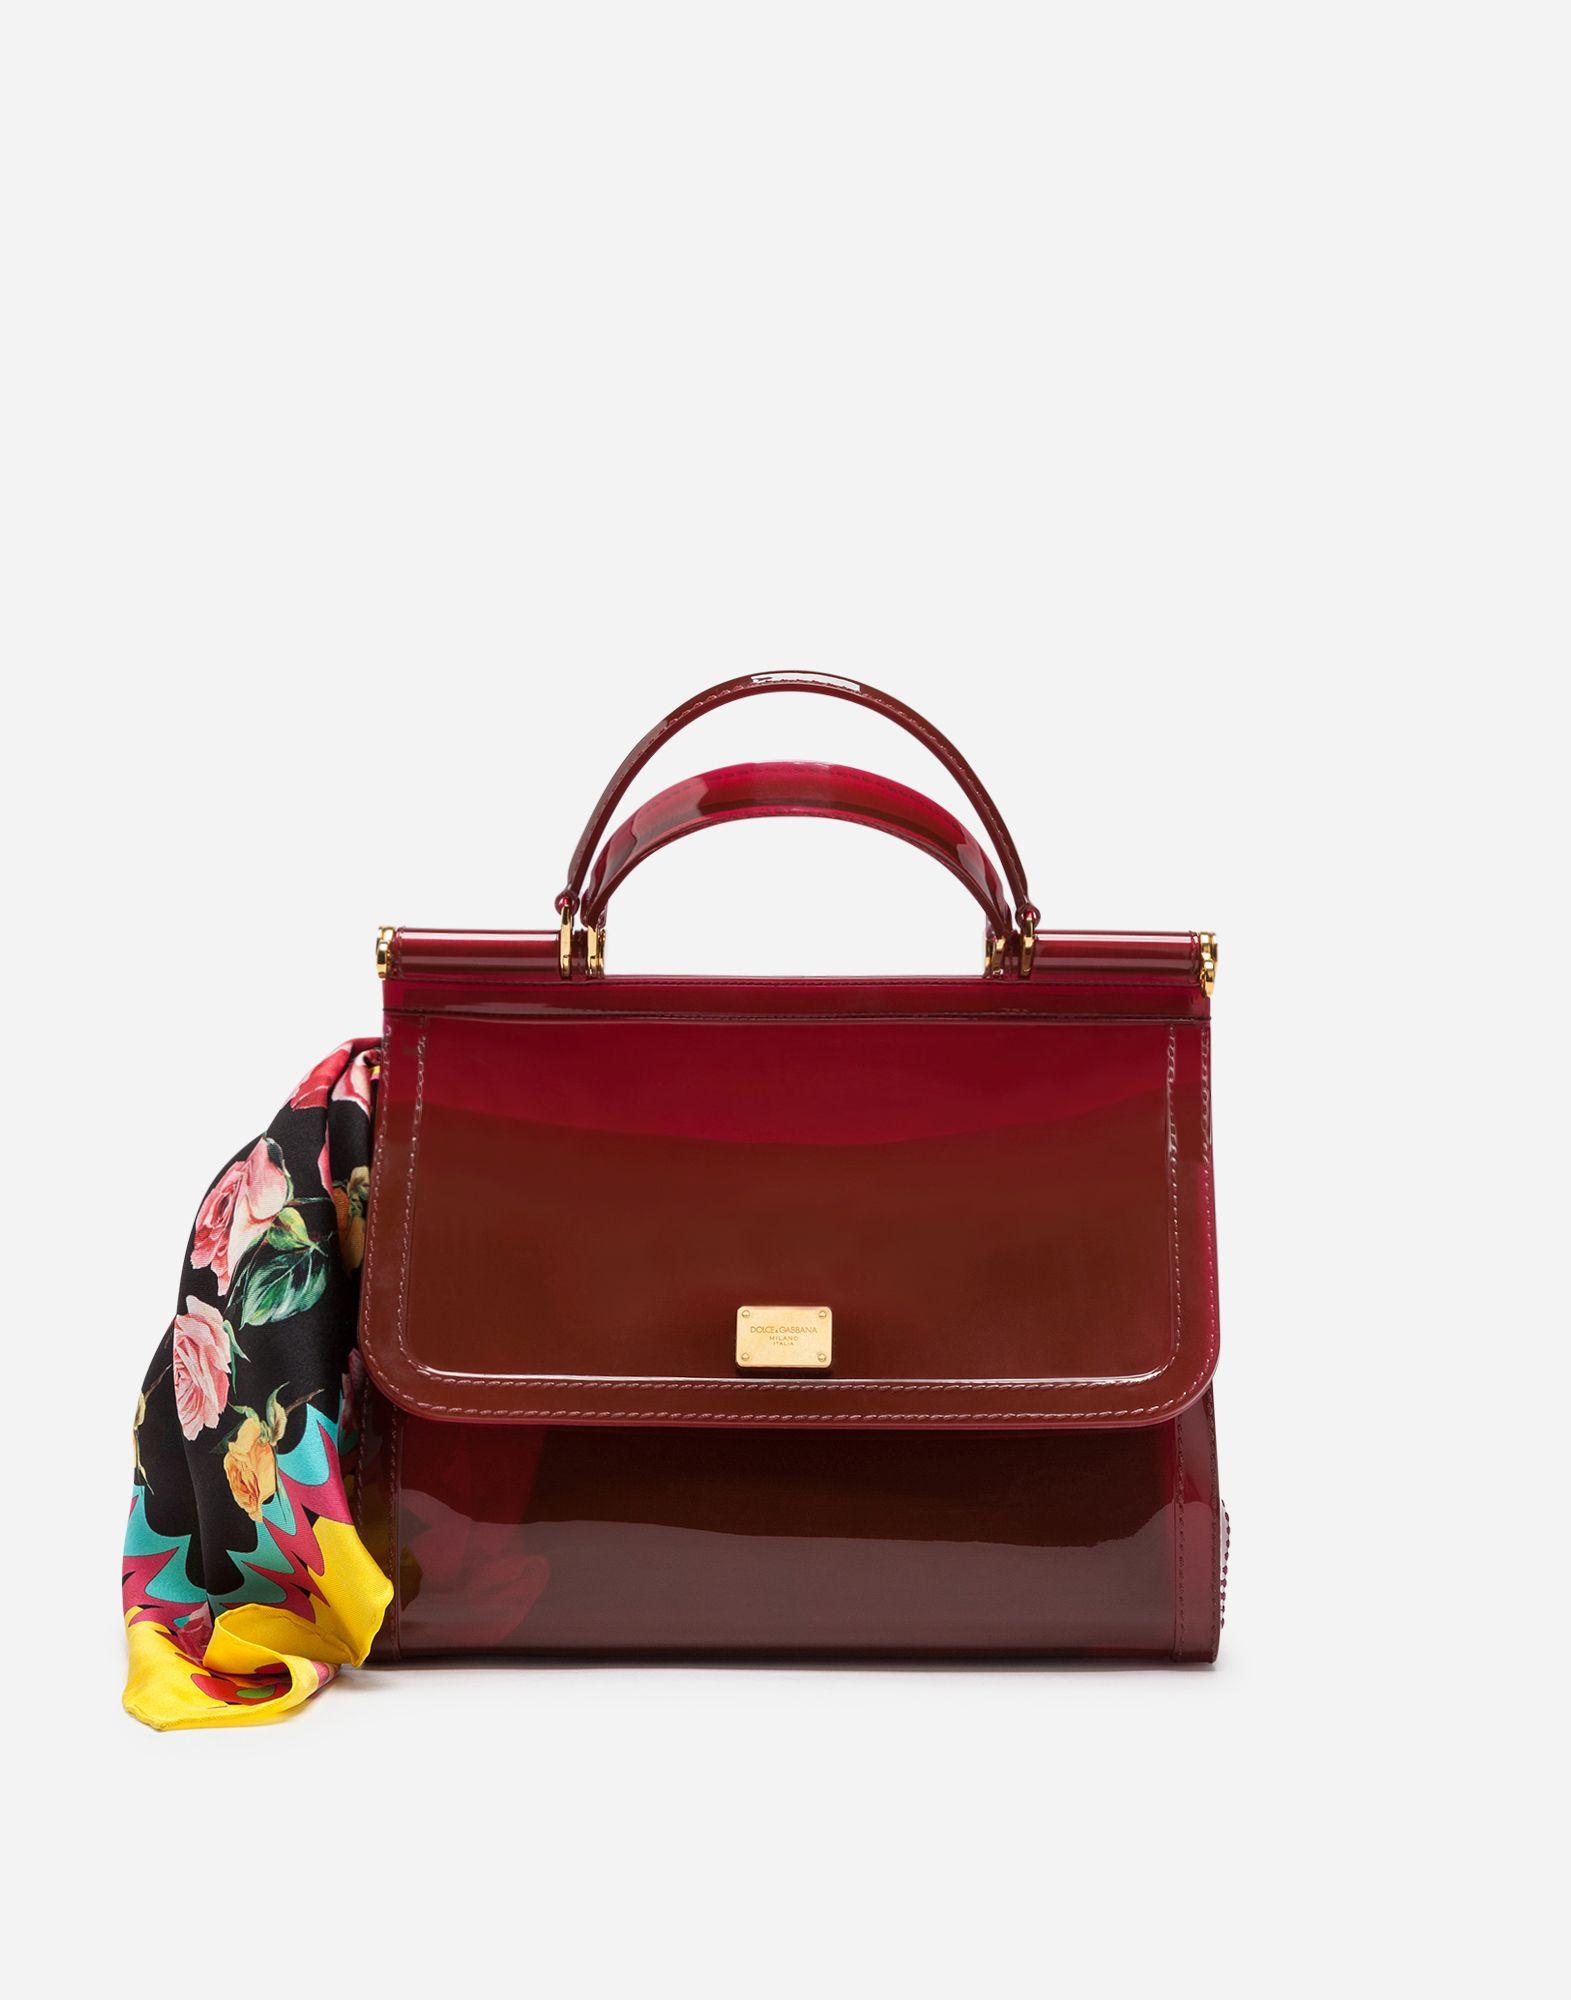 Dolce Gabbana Semi Transparent Rubber Burgundy Sicily Handbag 995